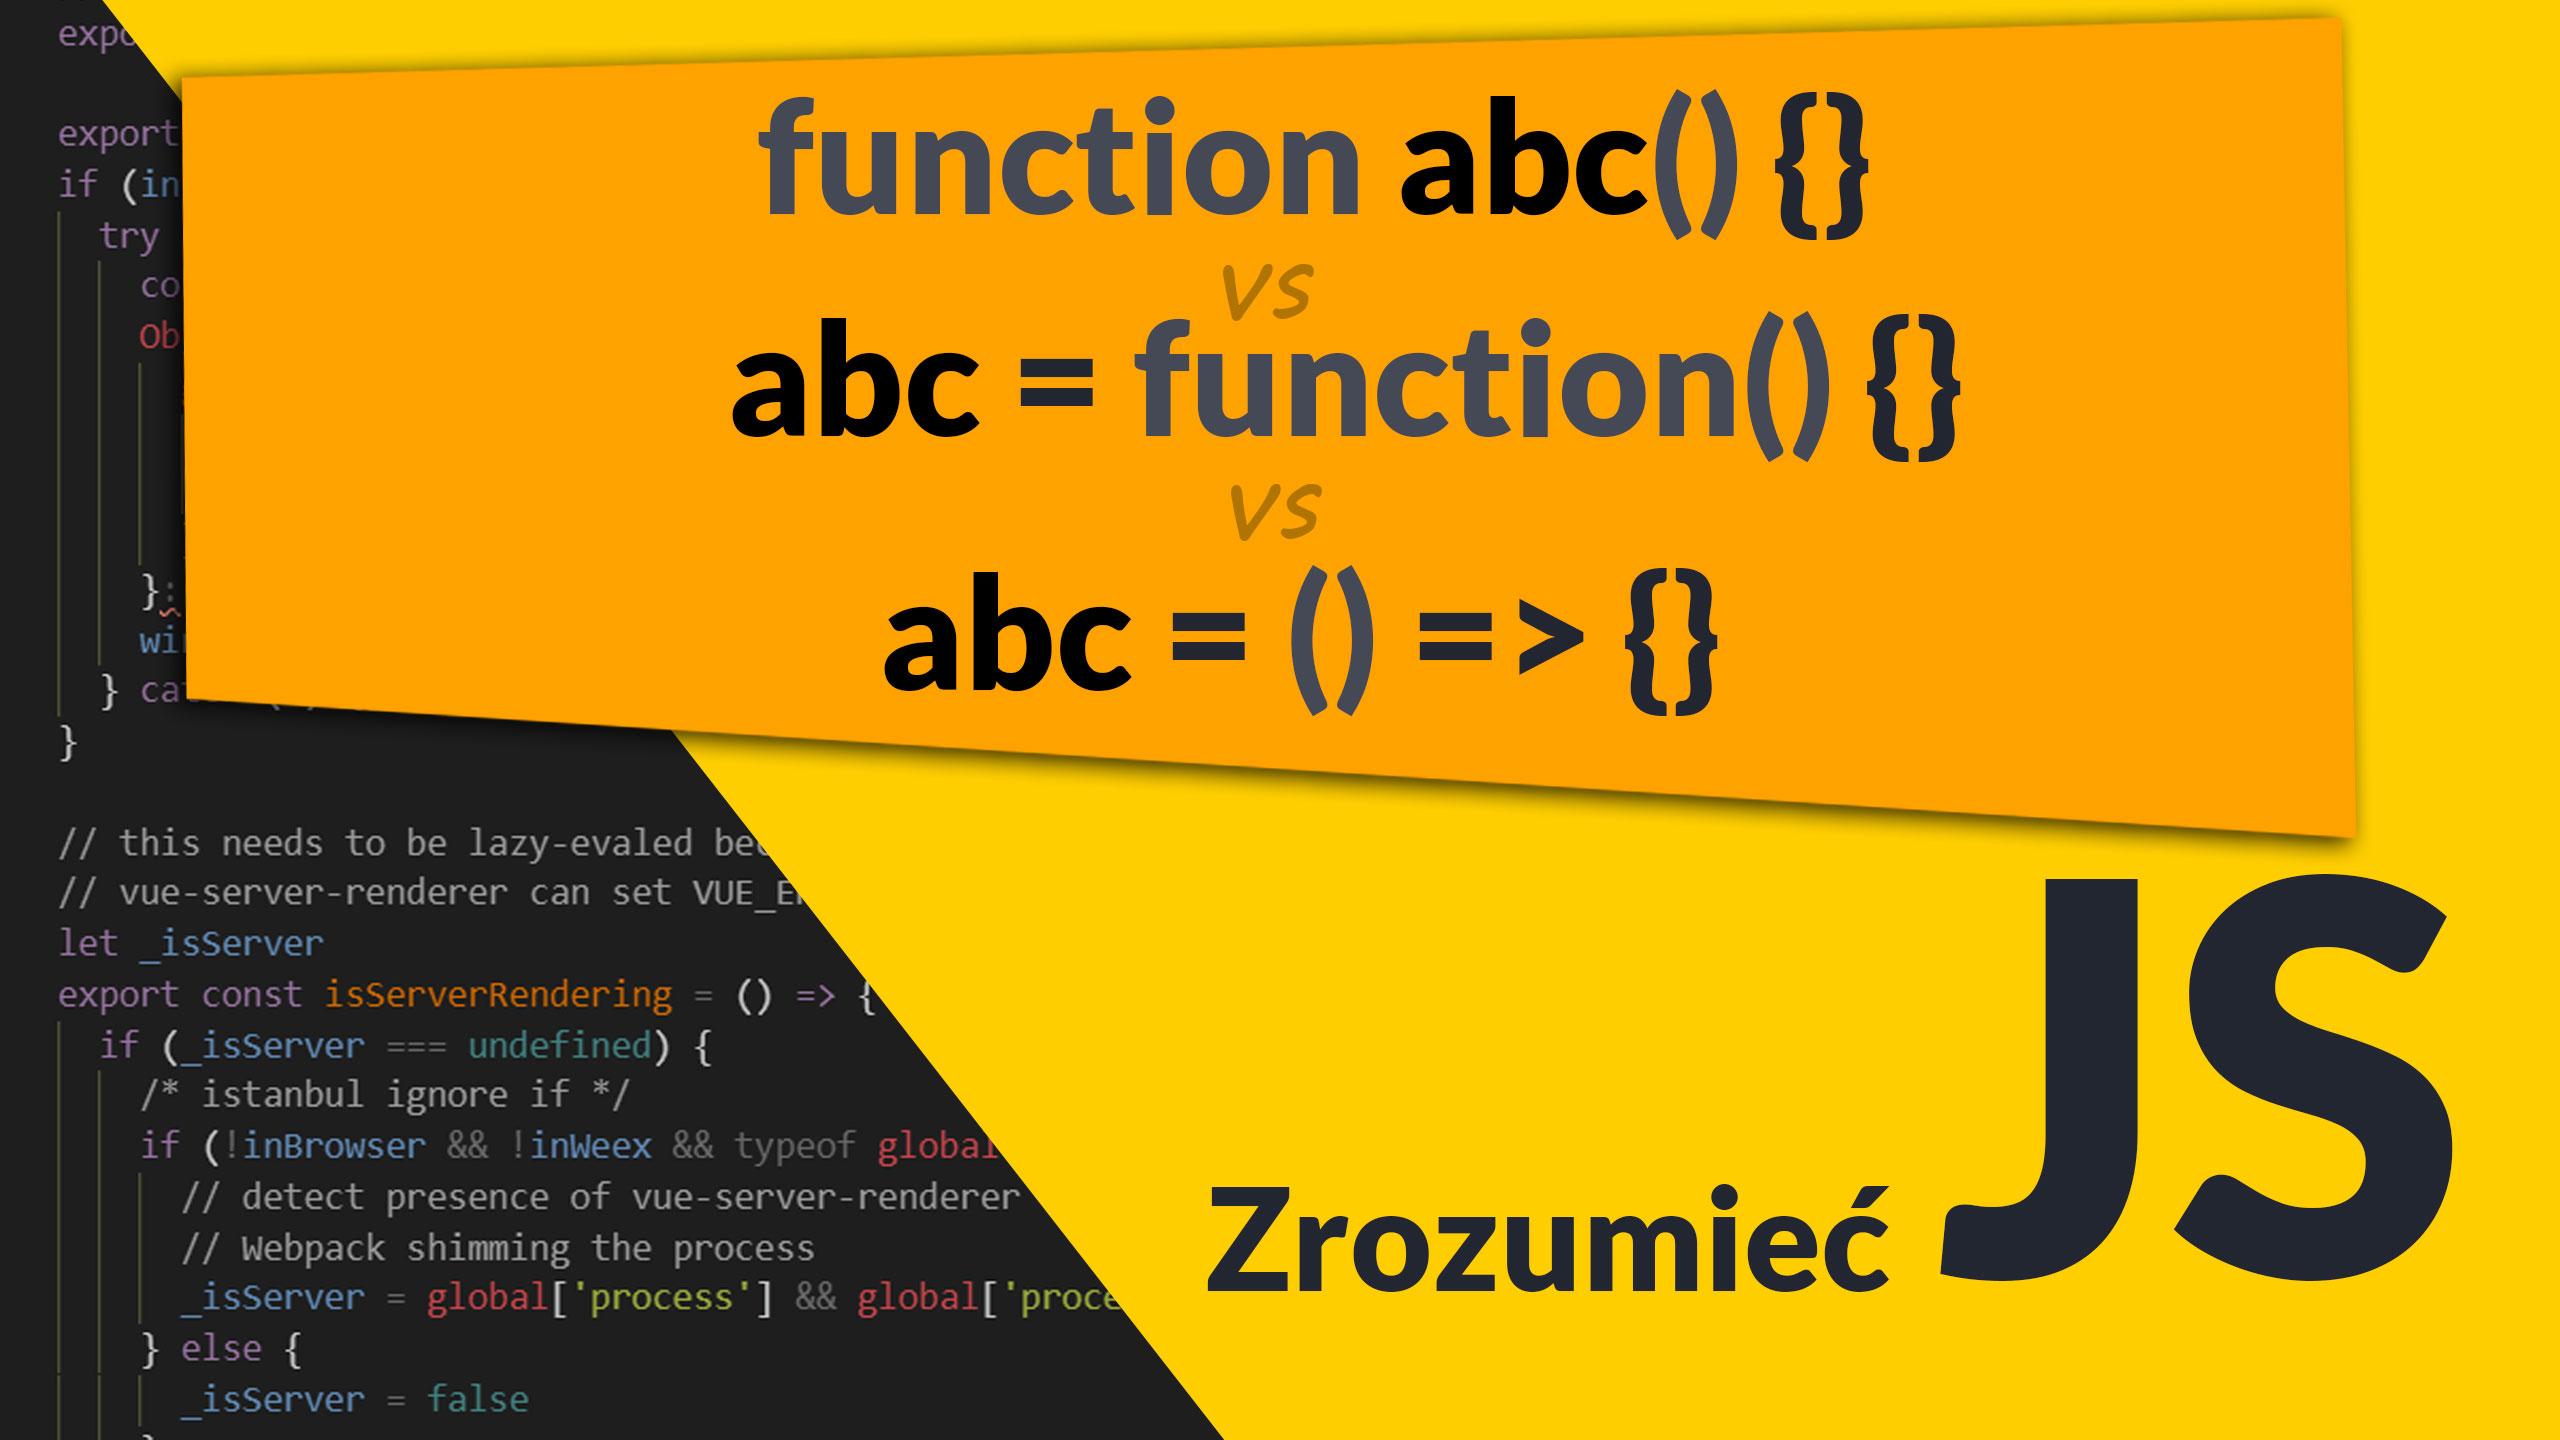 functions differences - Różnice pomiędzy funkcjami (function declaration, function expression, arrow function) #8 Zrozumieć JavaScript